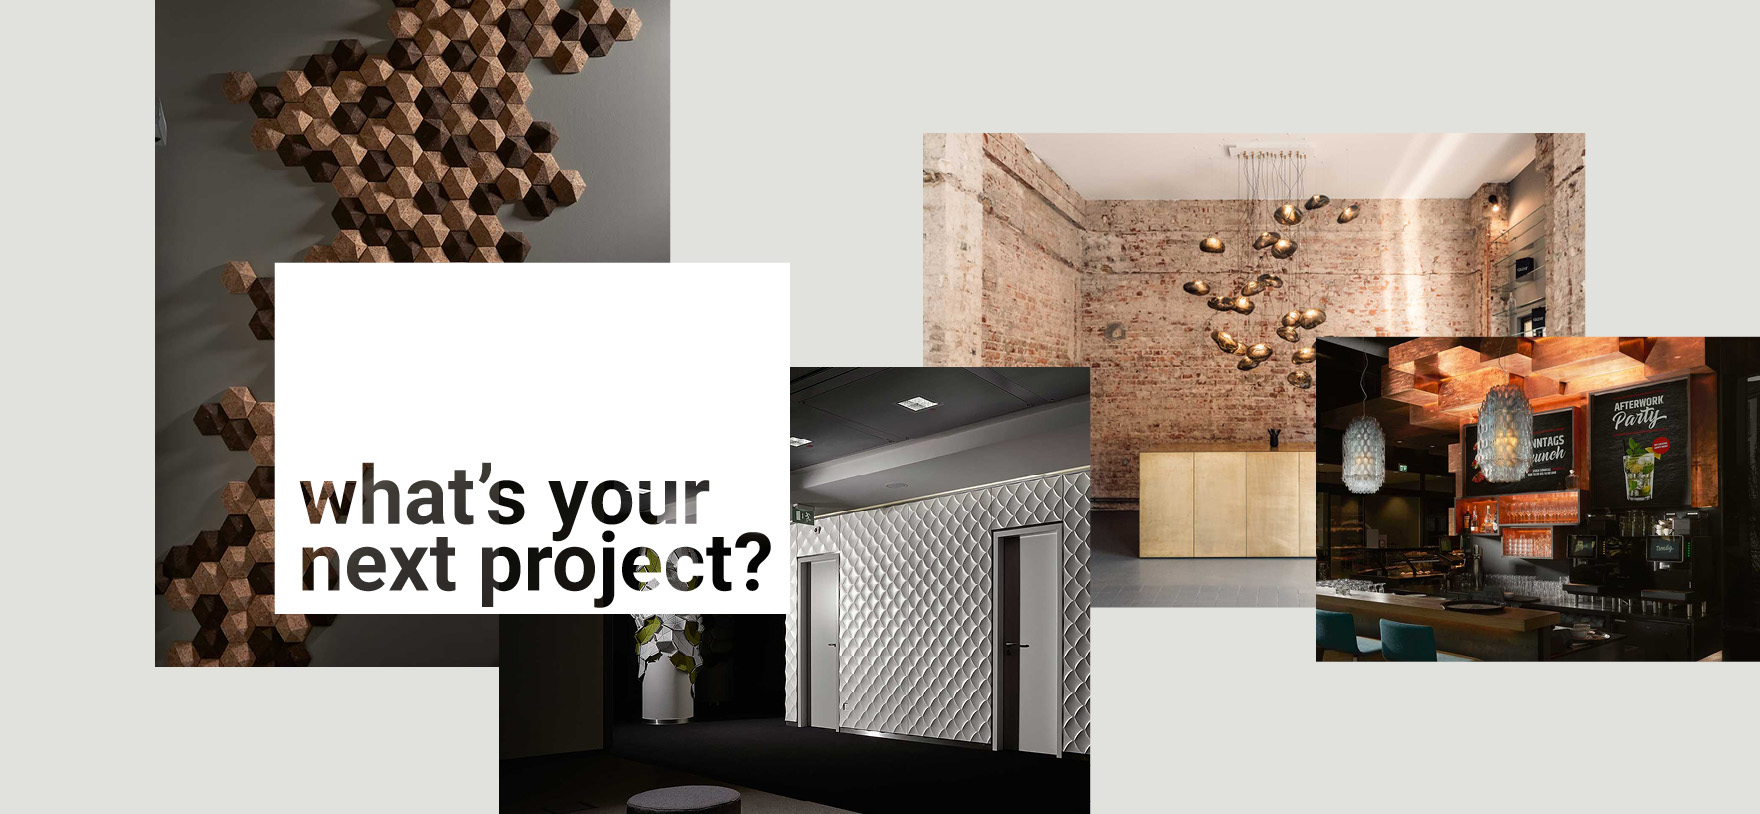 wandpaneele-deckenpaneele-wandverkleidungen-projekt